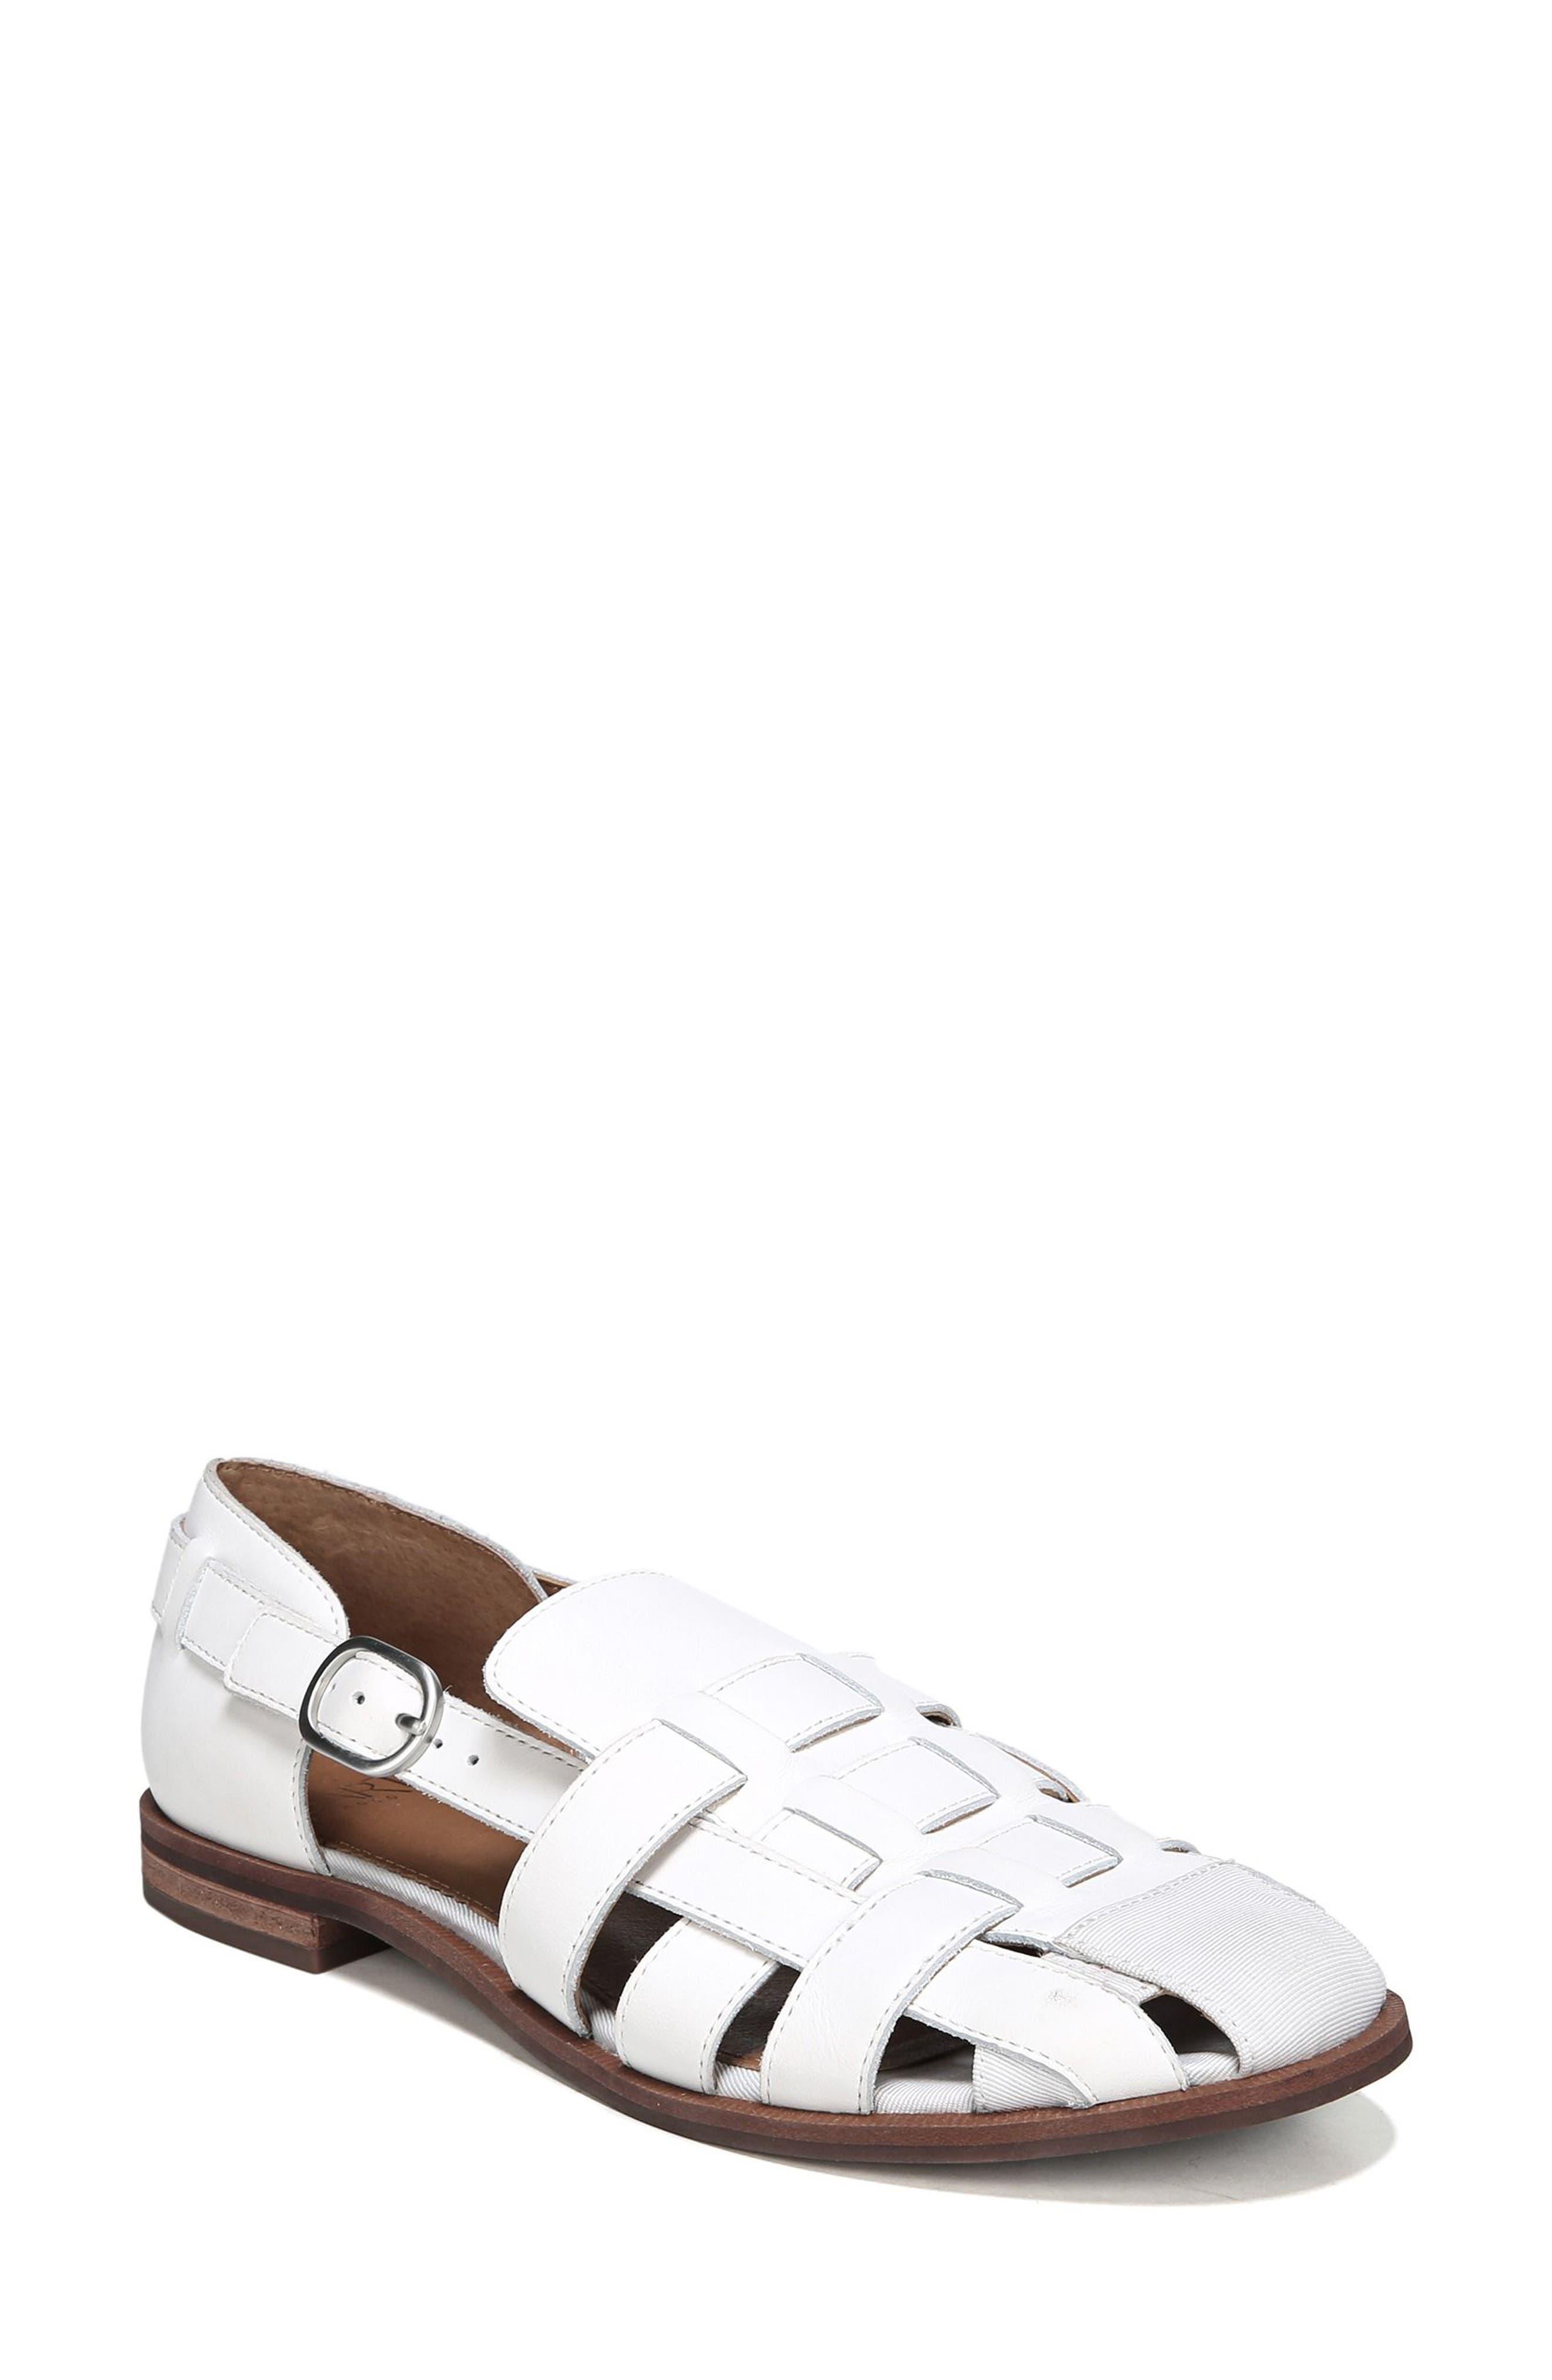 Lulu Fisherman Sandal,                         Main,                         color, Bright White Leather